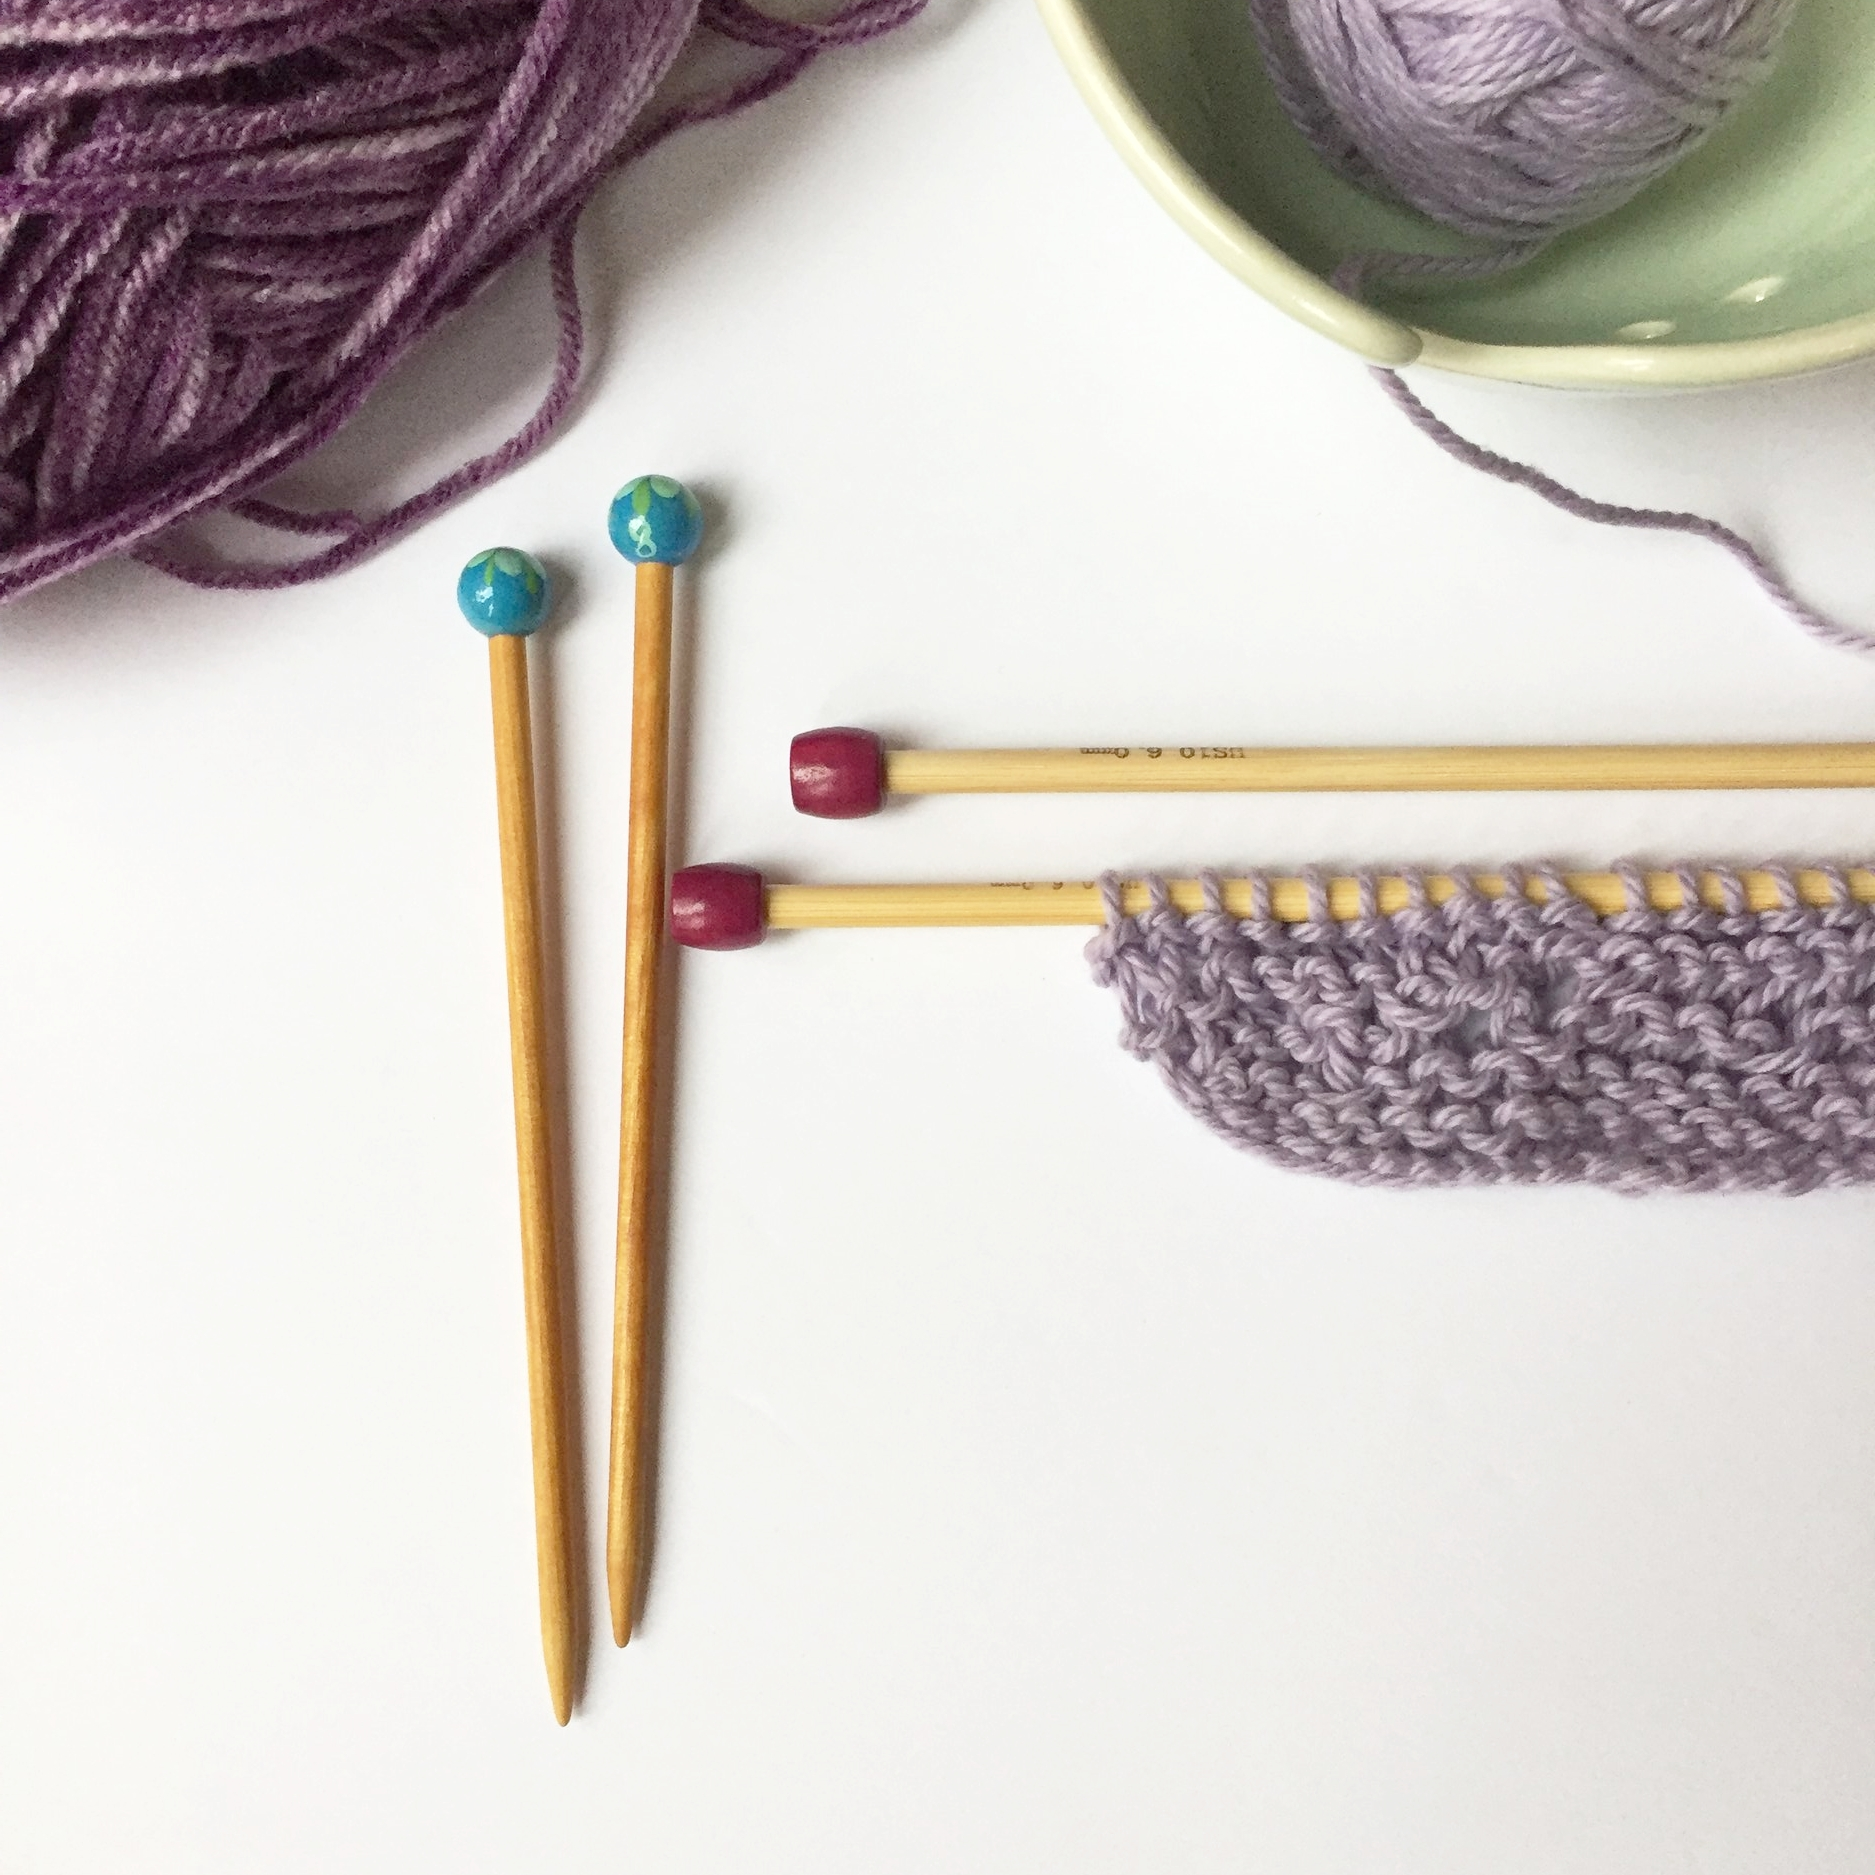 Tip: shorter wooden knitting needles are best for little hands and beginners.